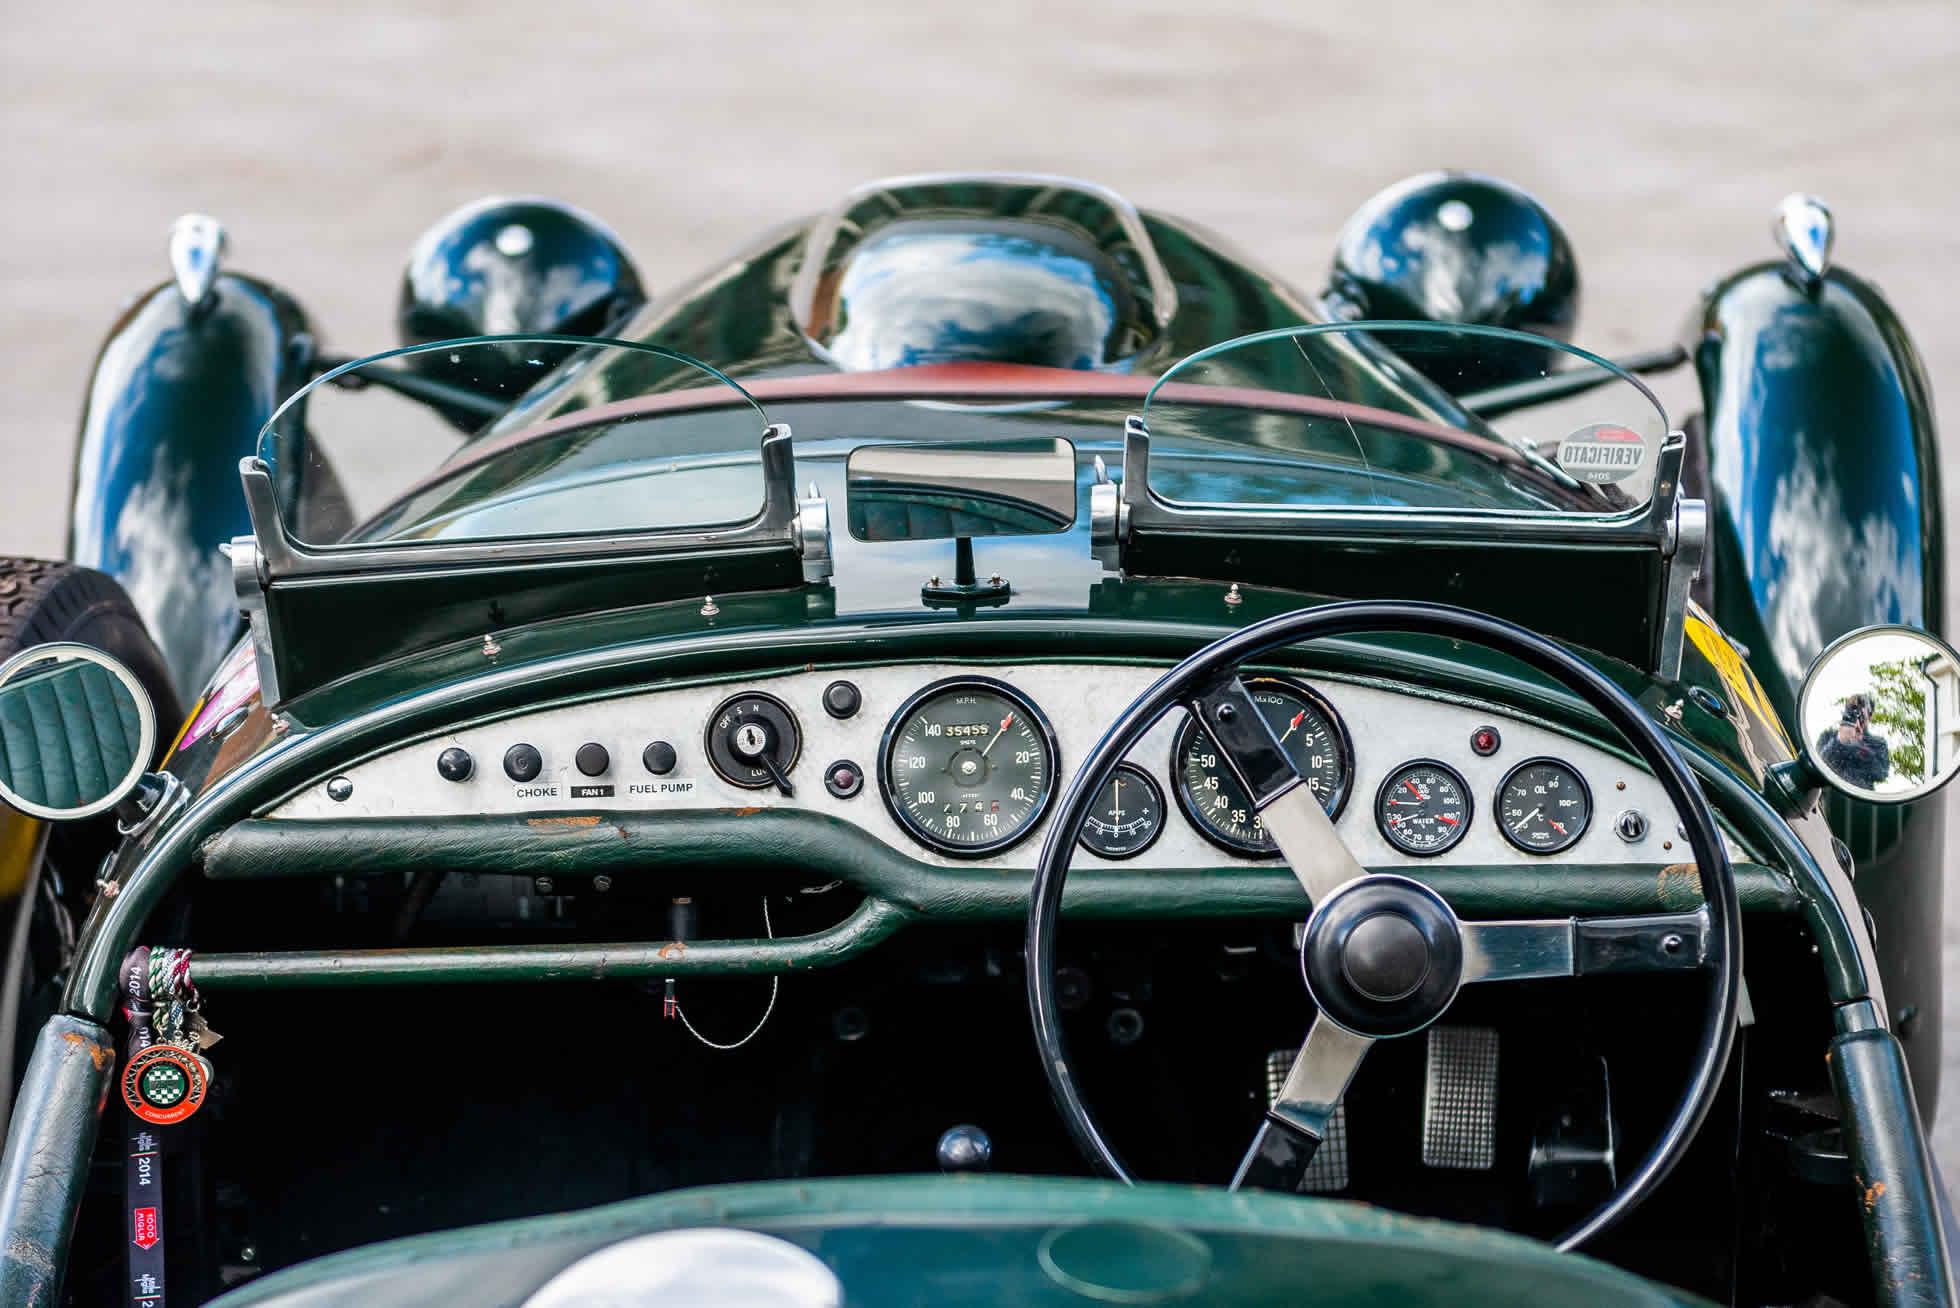 For sale 1951 Frazer Nash Le Mans Replica Mk 1, Sports Purpose Bicester Heritage, dash